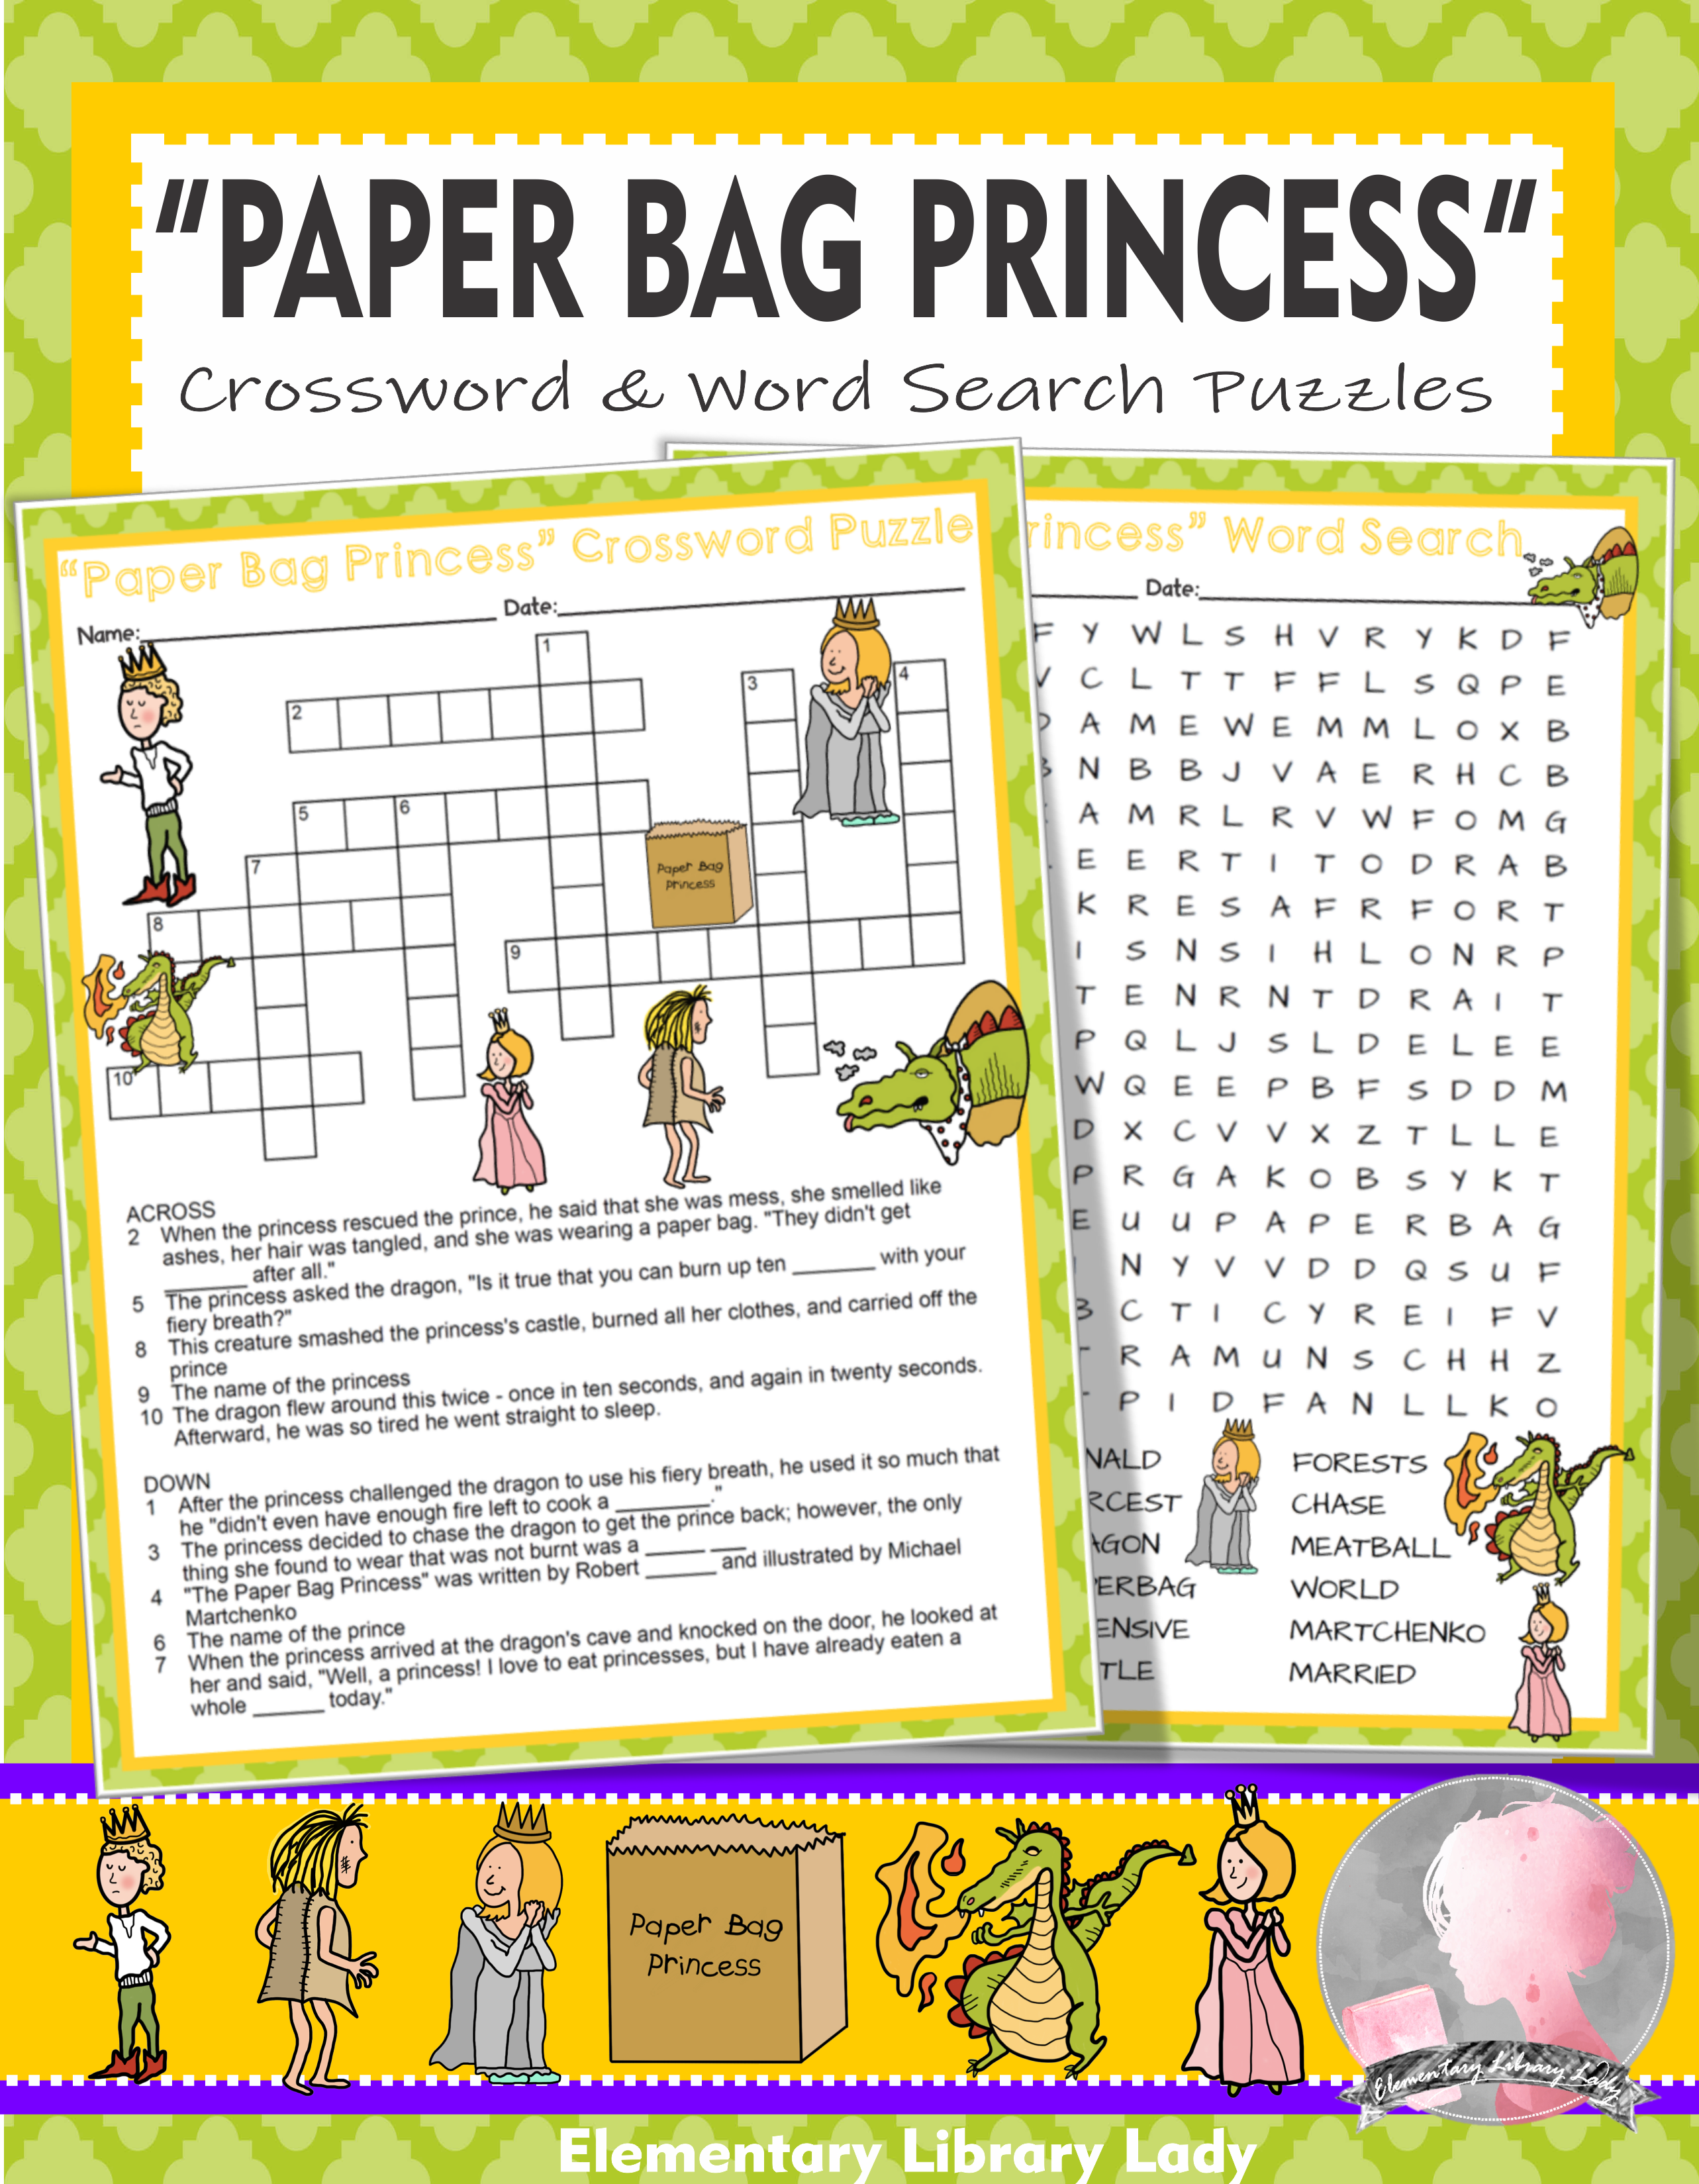 Paper Bag Princess Activities Robert Munsch Crossword Puzzle Word Search Paper Bag Princess Teaching Elementary Princess Activities [ 3298 x 2566 Pixel ]